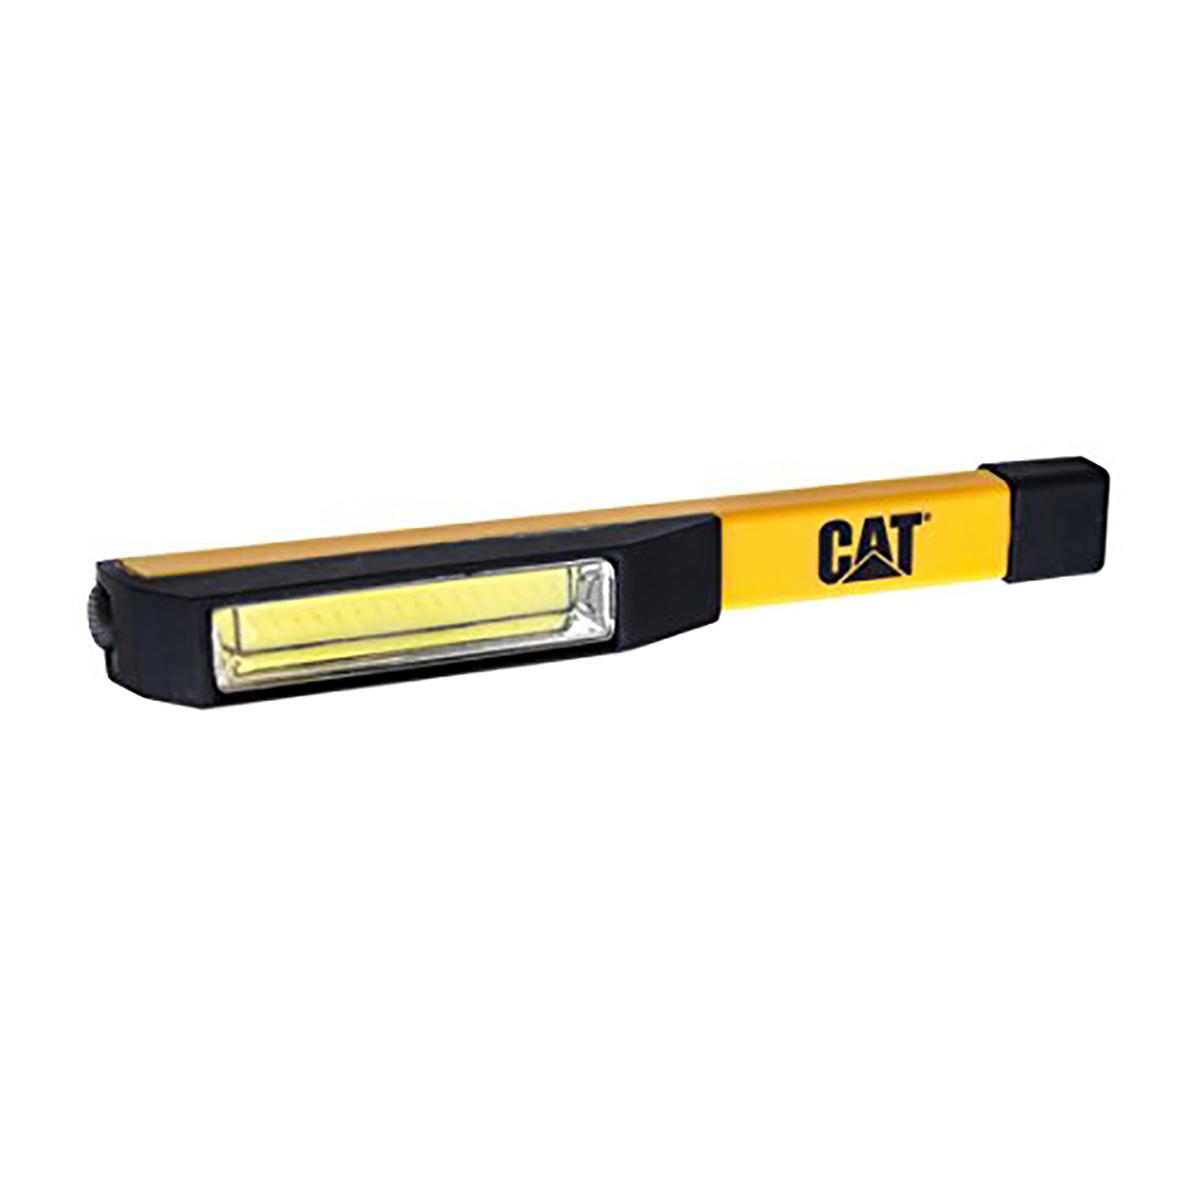 CAT Pocket COB work light